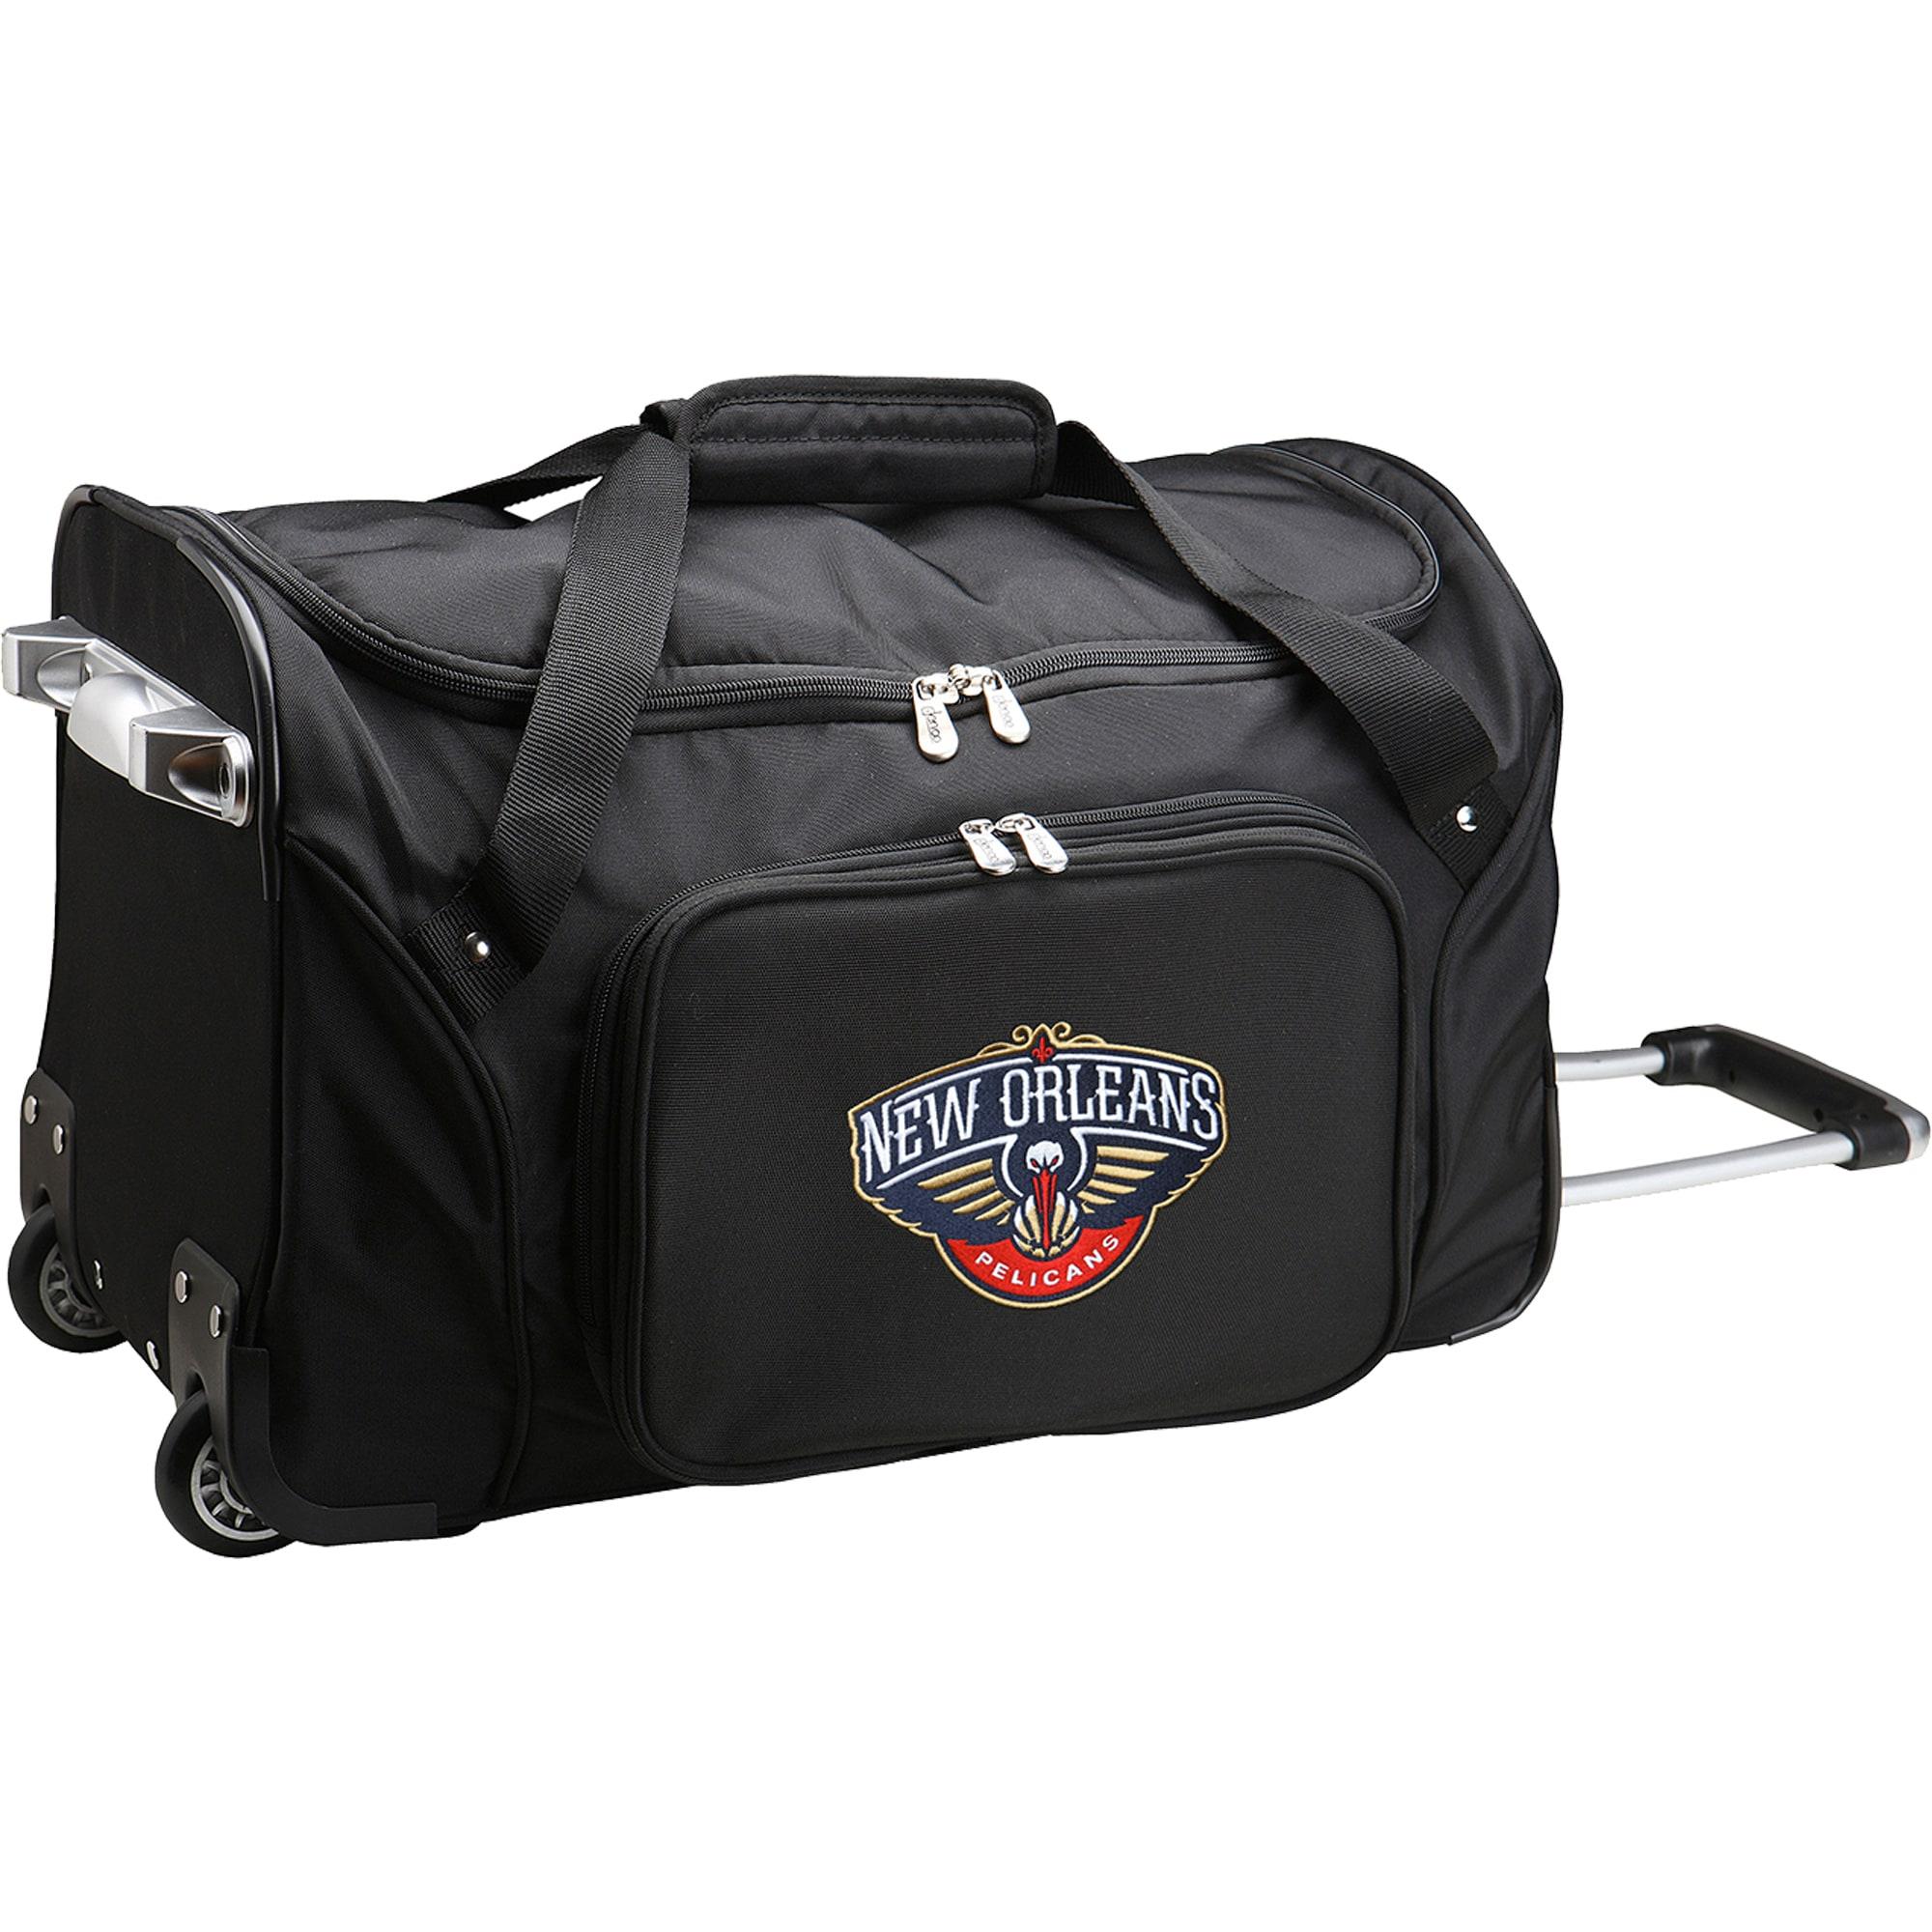 "New Orleans Pelicans 22"" 2-Wheeled Duffel Bag - Black"